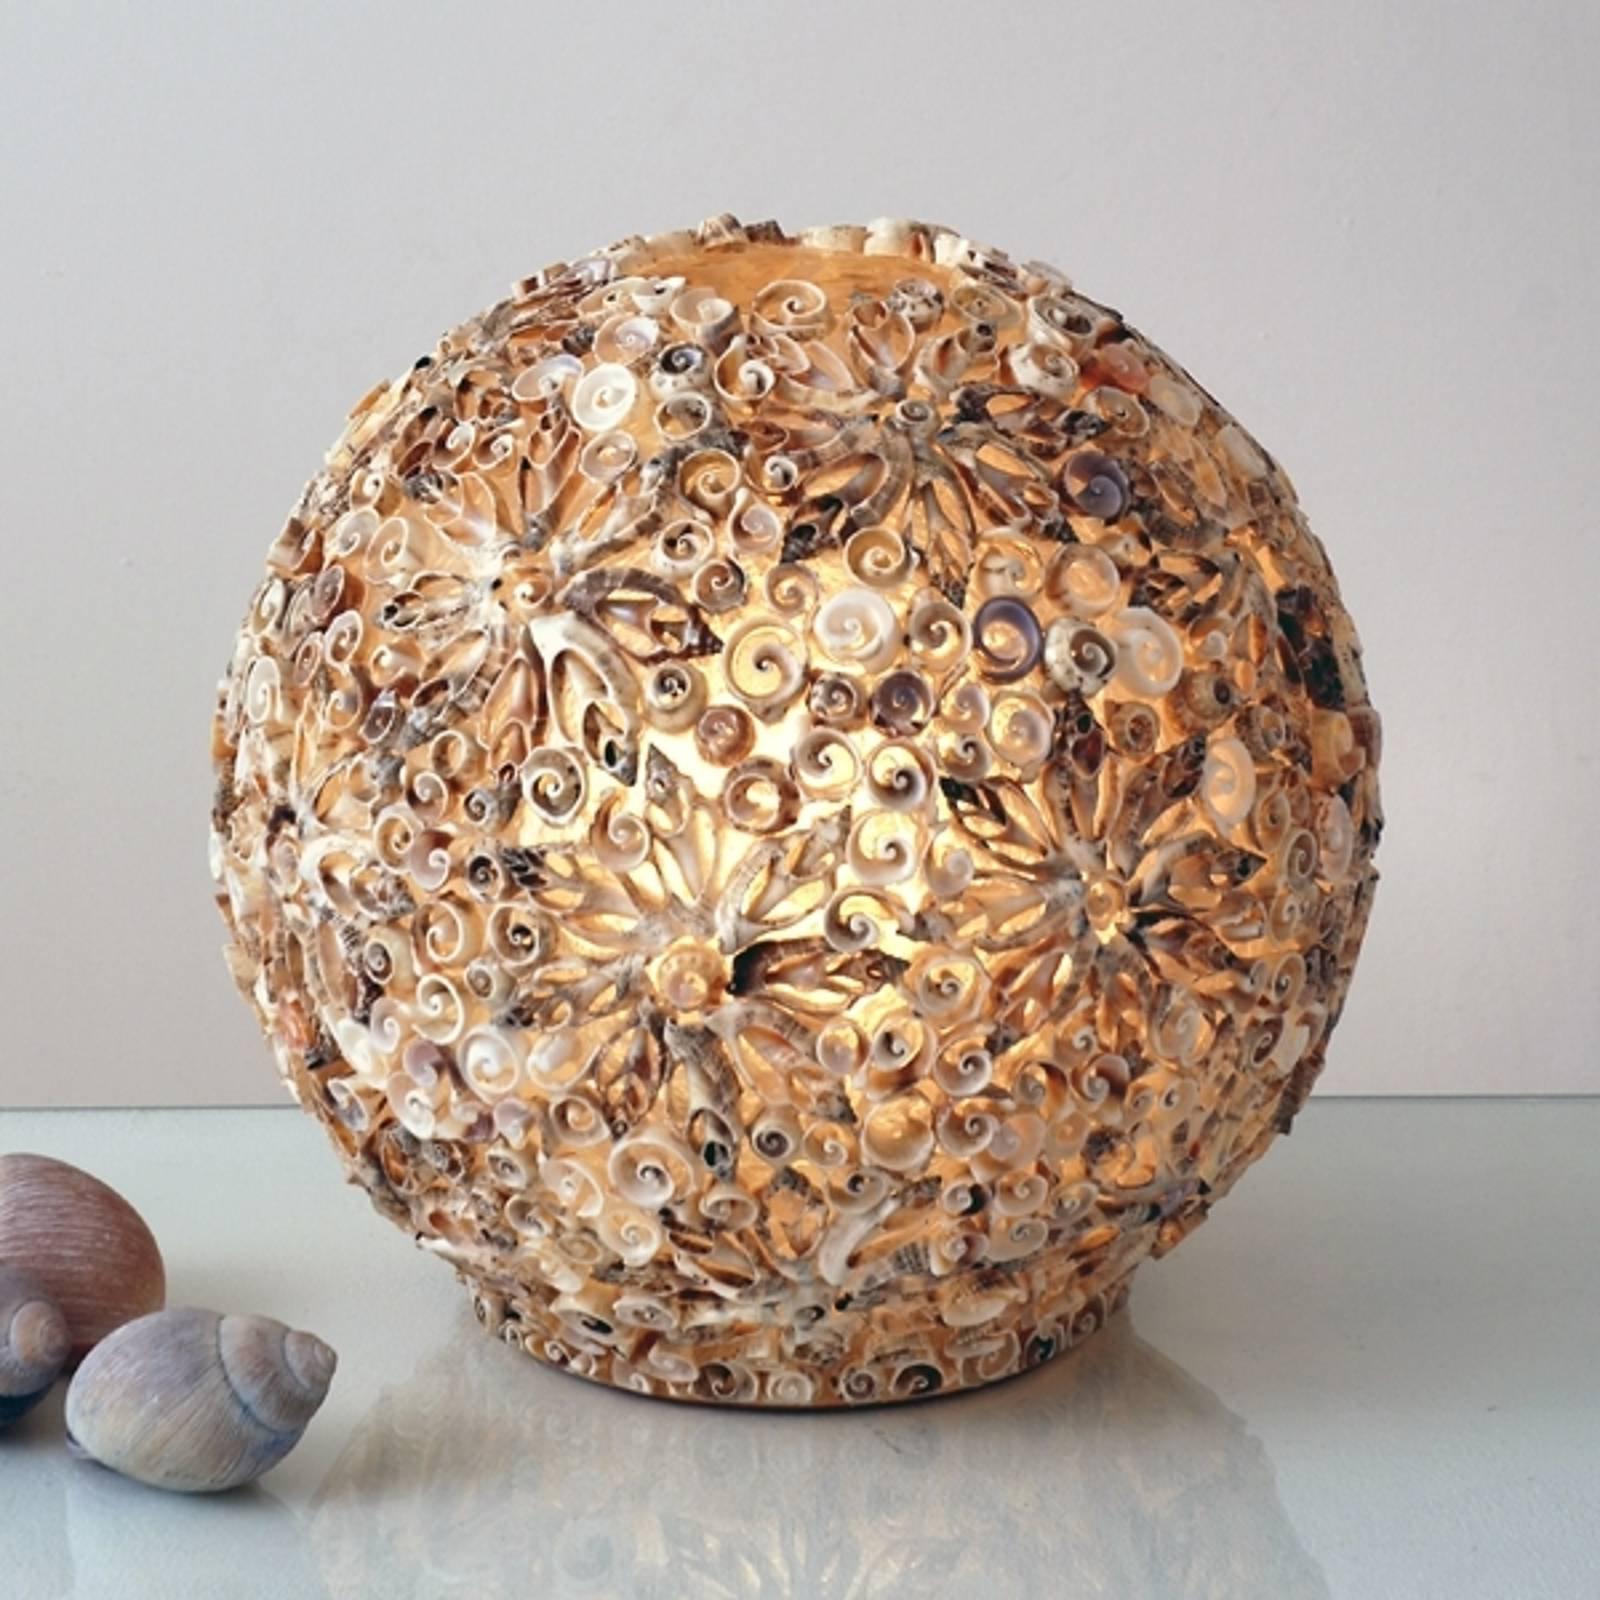 Dekorativ gulvlampe Skjellball, 30 cm